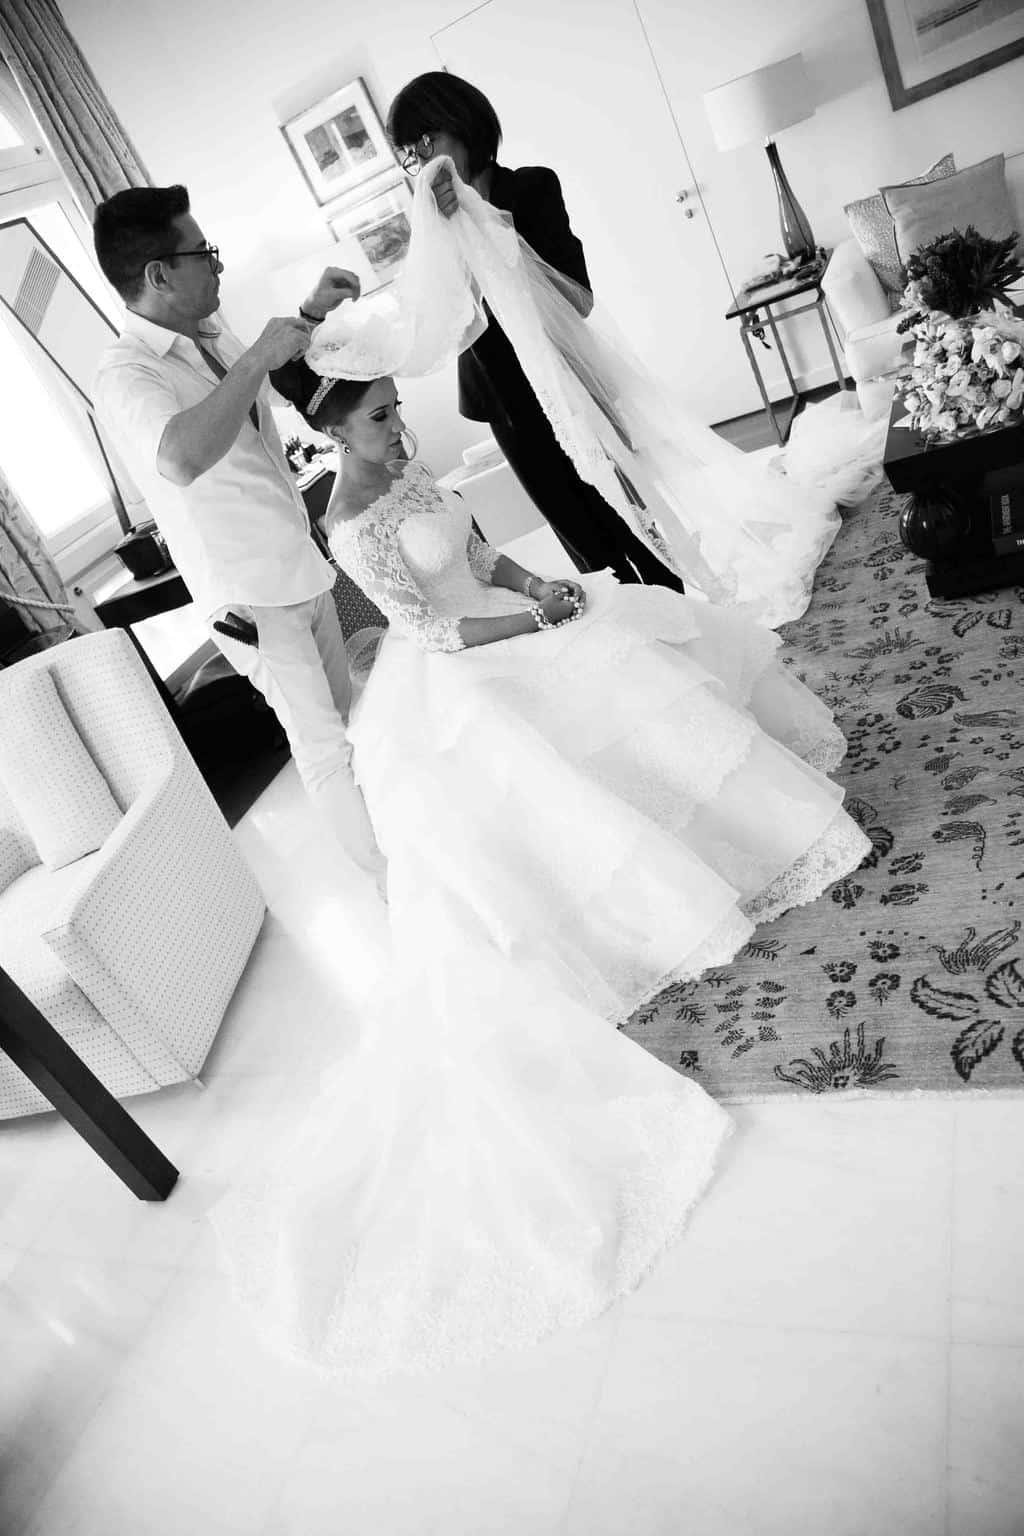 Casamento-Clássico-Casamento-tradicional-Copacabana-Palace-Marcelo-Hicho-Monica-Roias-Ribas-Foto-e-Vídeo-Tuanny-e-Bernardo-CaseMe